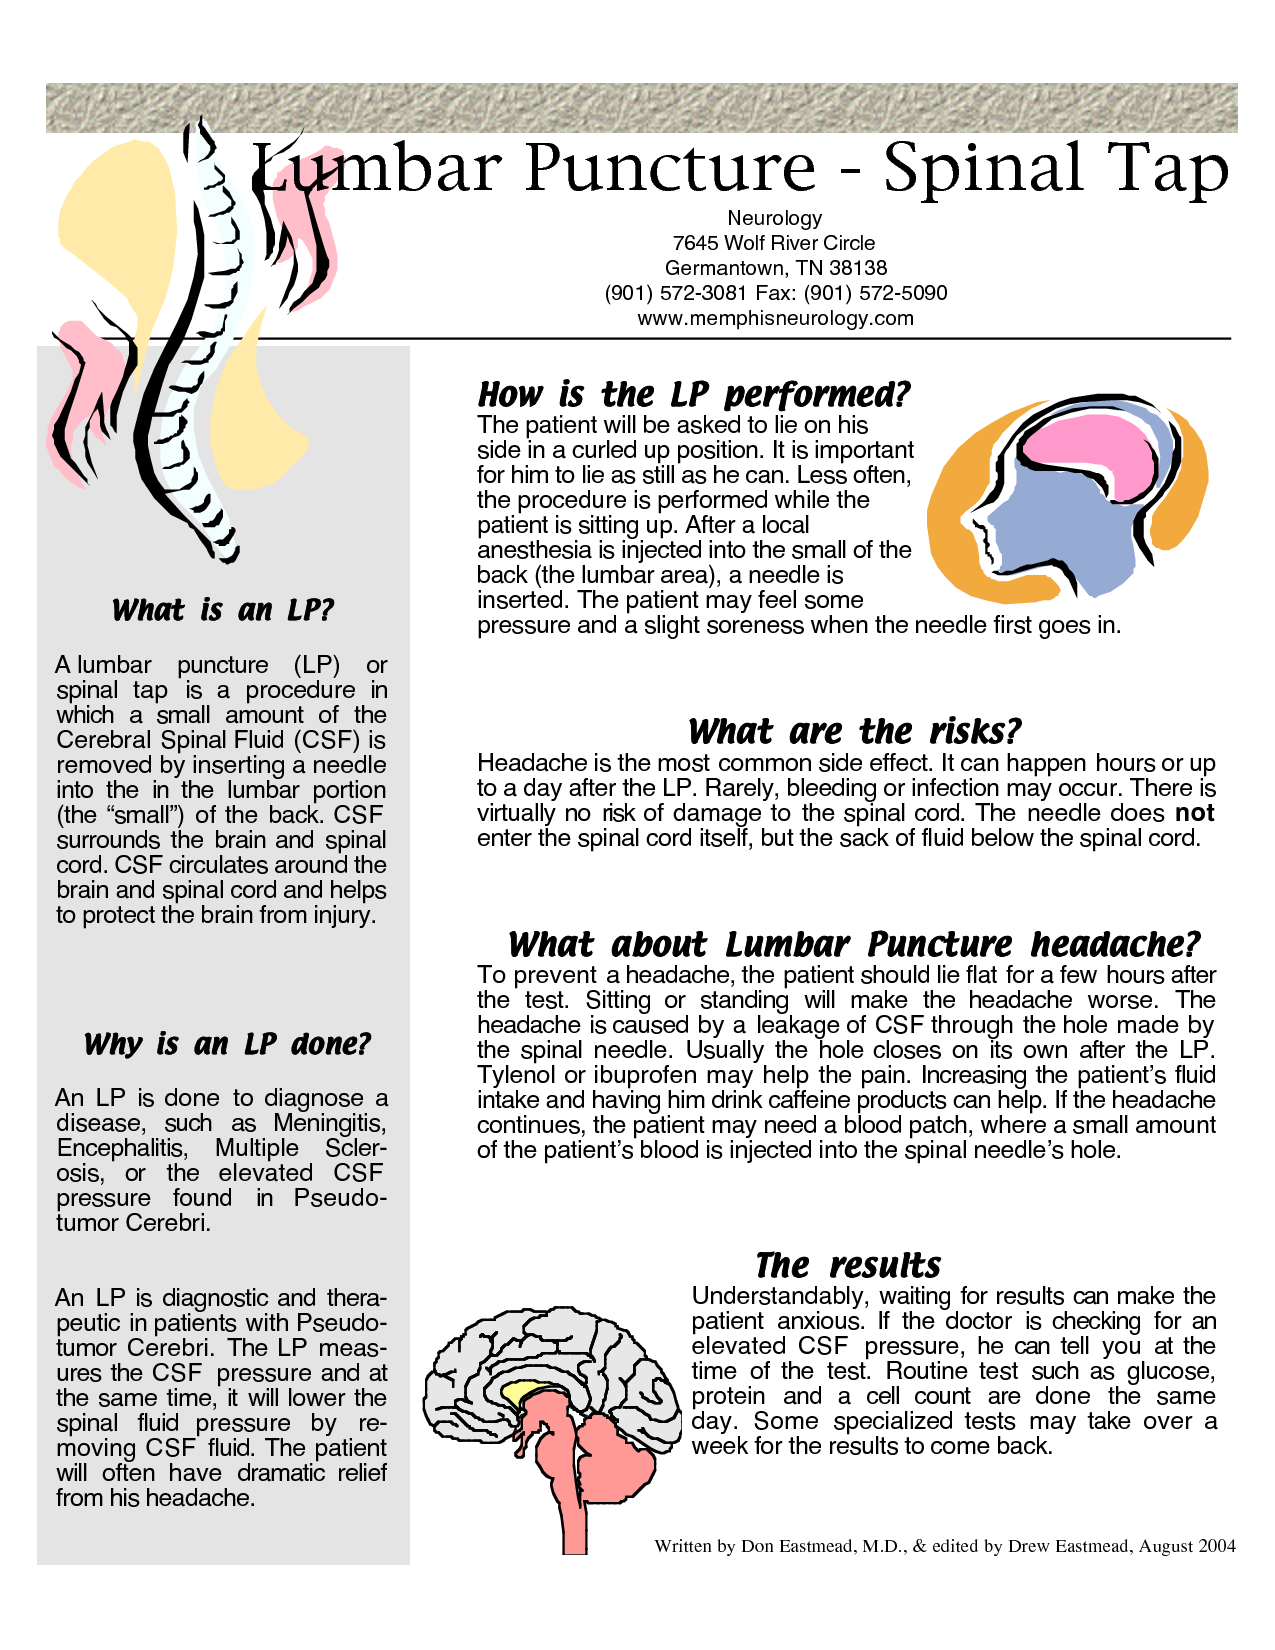 Spinal Tap Procedure | Lumbar Puncture - Spinal Tap … | Pinteres…